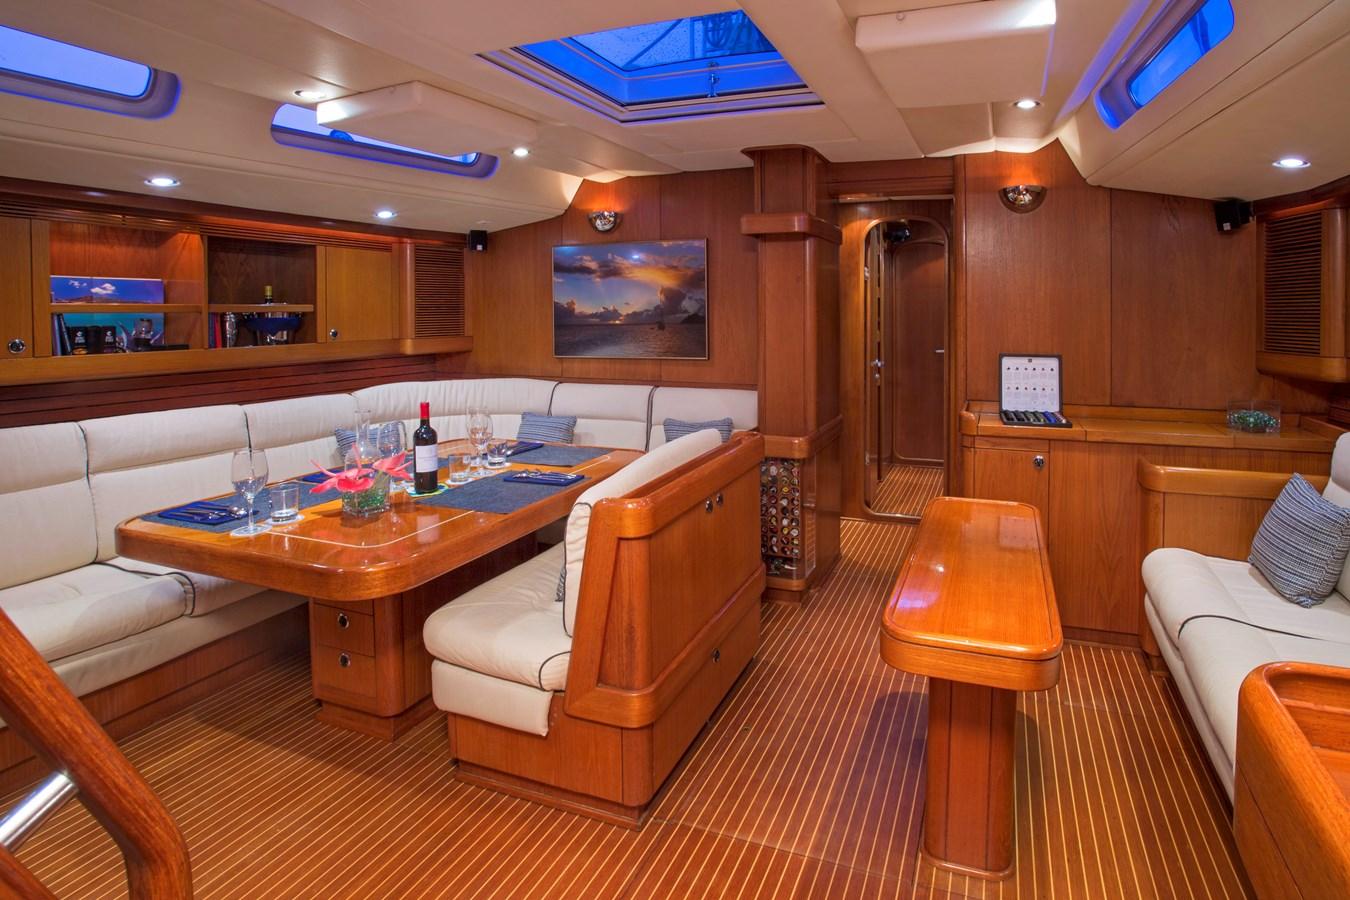 121314BTSI-0951 3 SWAN SWAN 68 Cruising Sailboat 2586764